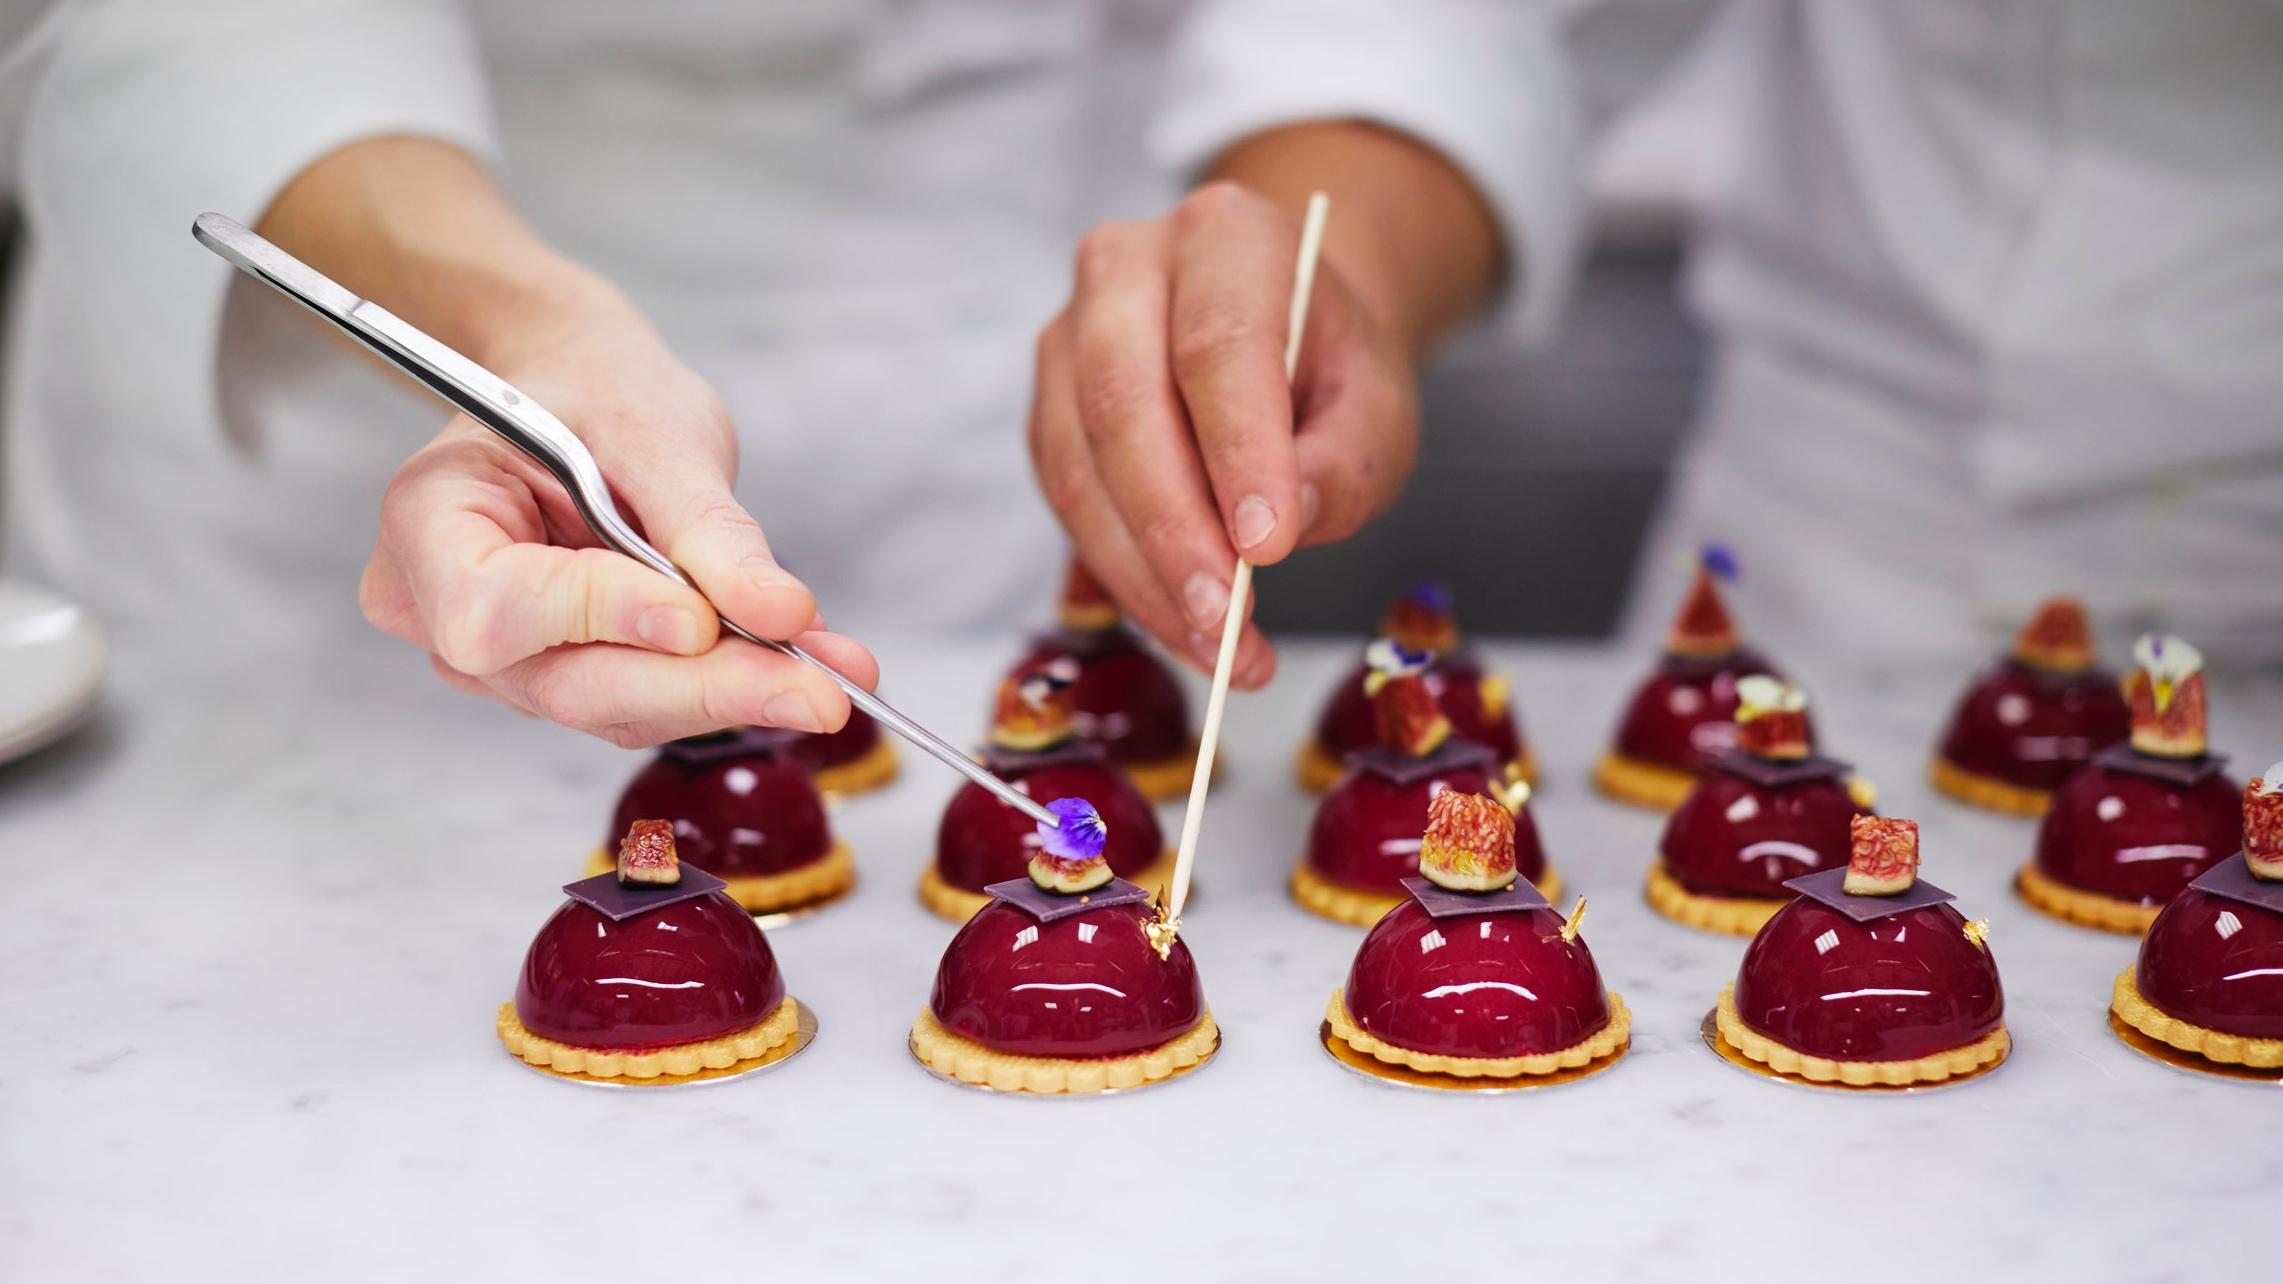 20180828-making-cakes646.jpg